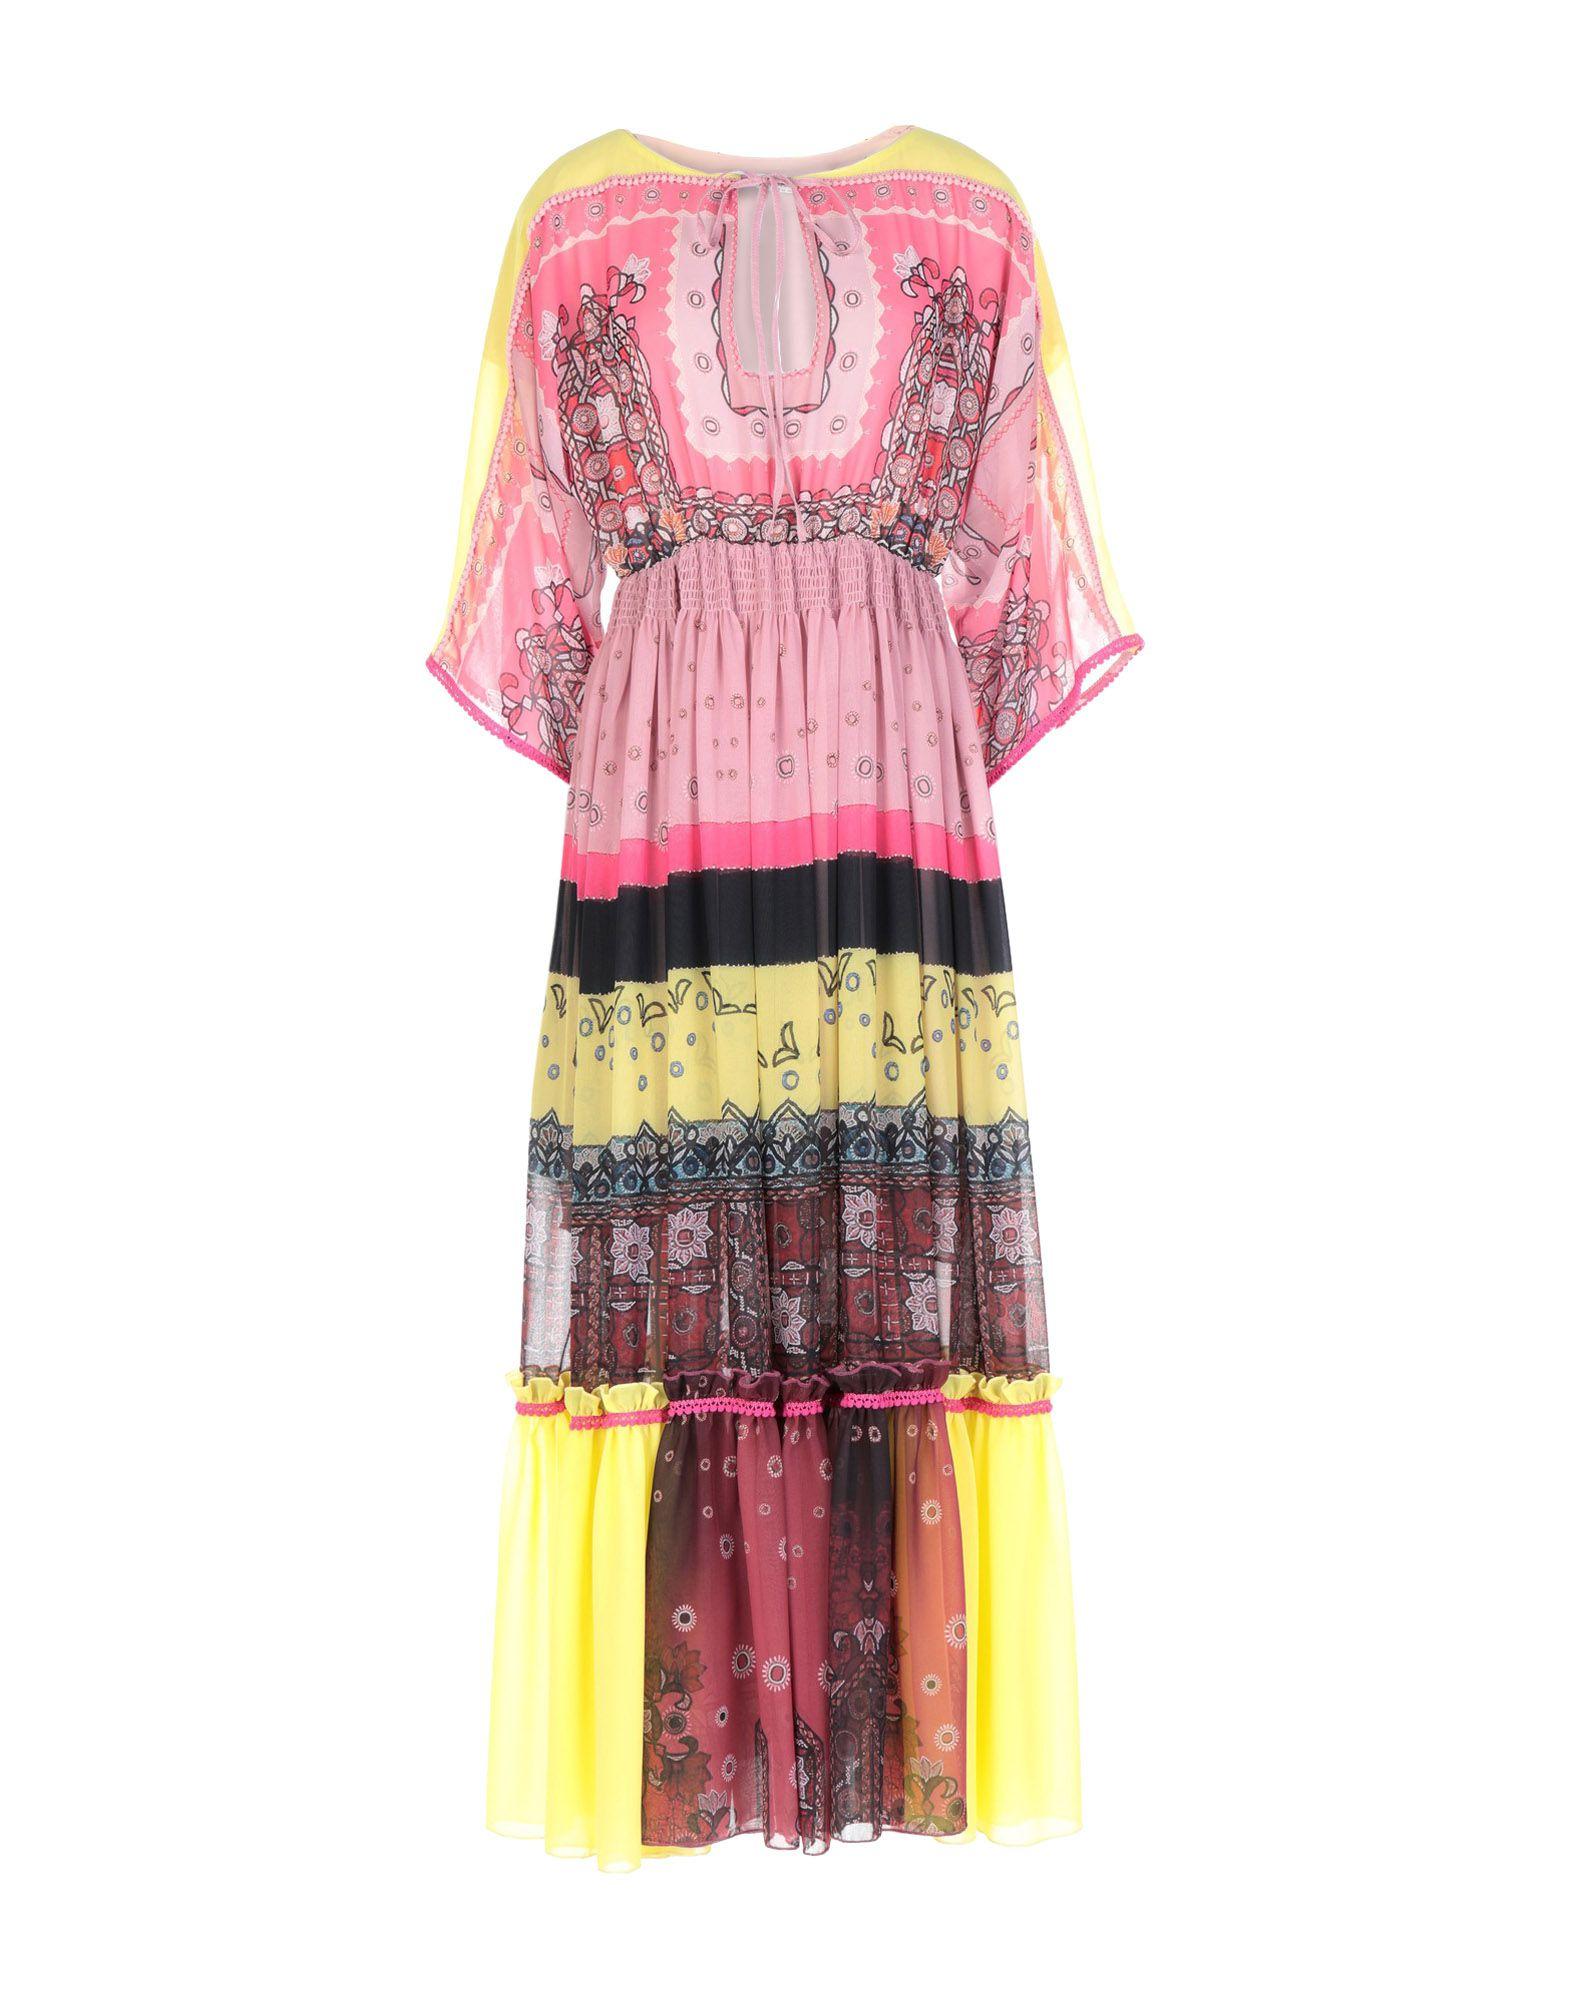 TENAX Платье длиной 3/4 burgundy choker neck crossover v front drape surplice top